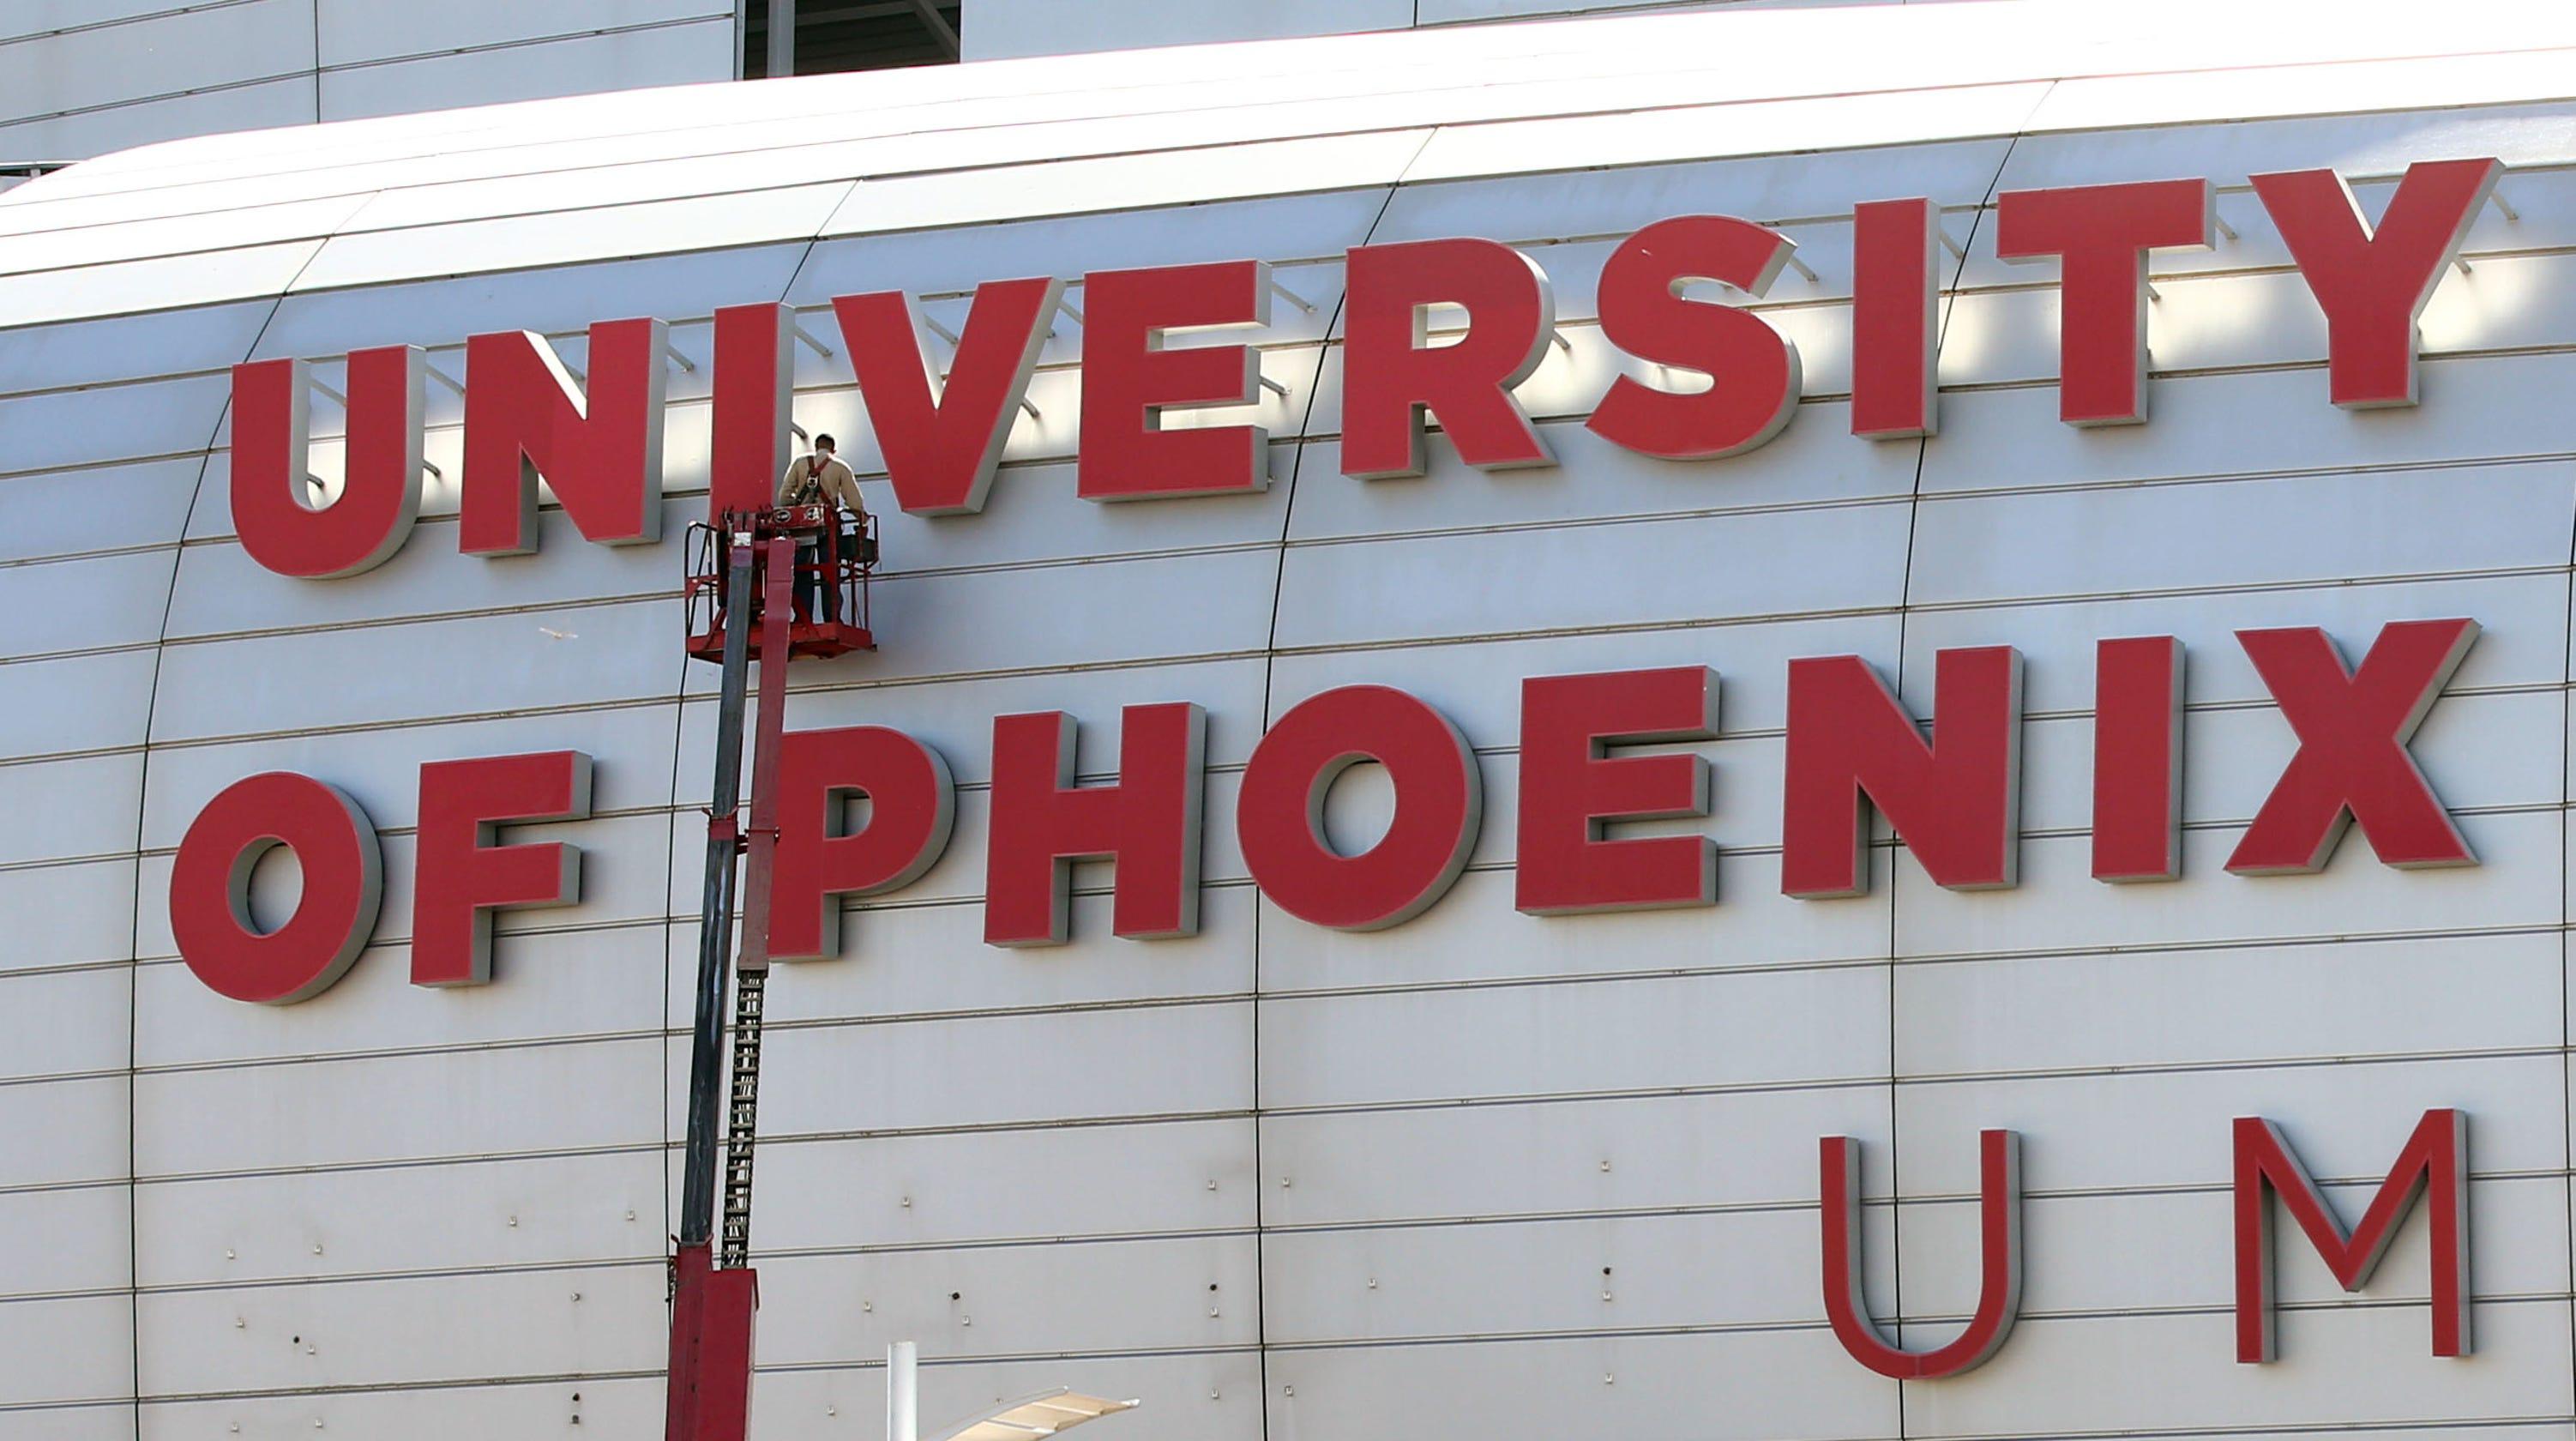 Arizona Cardinals start football season in renamed State